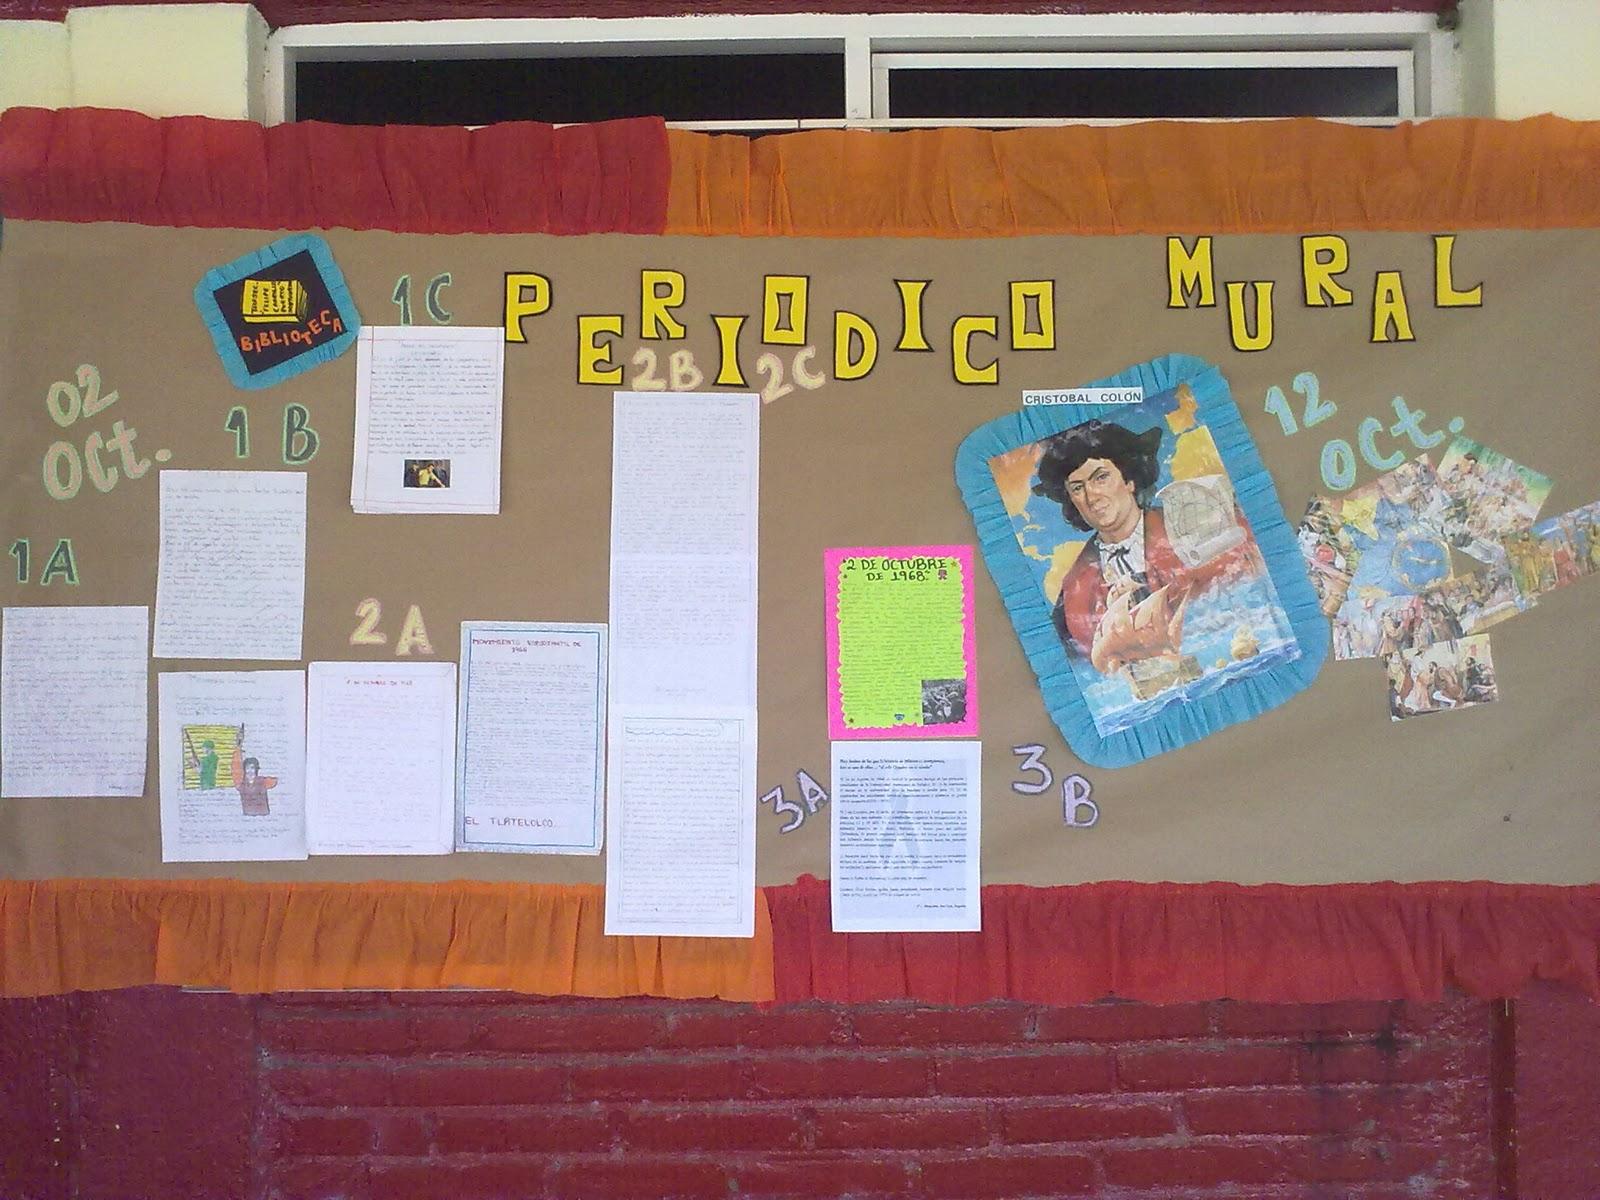 Bibliotecarrillo931 mural for Deportes para un periodico mural